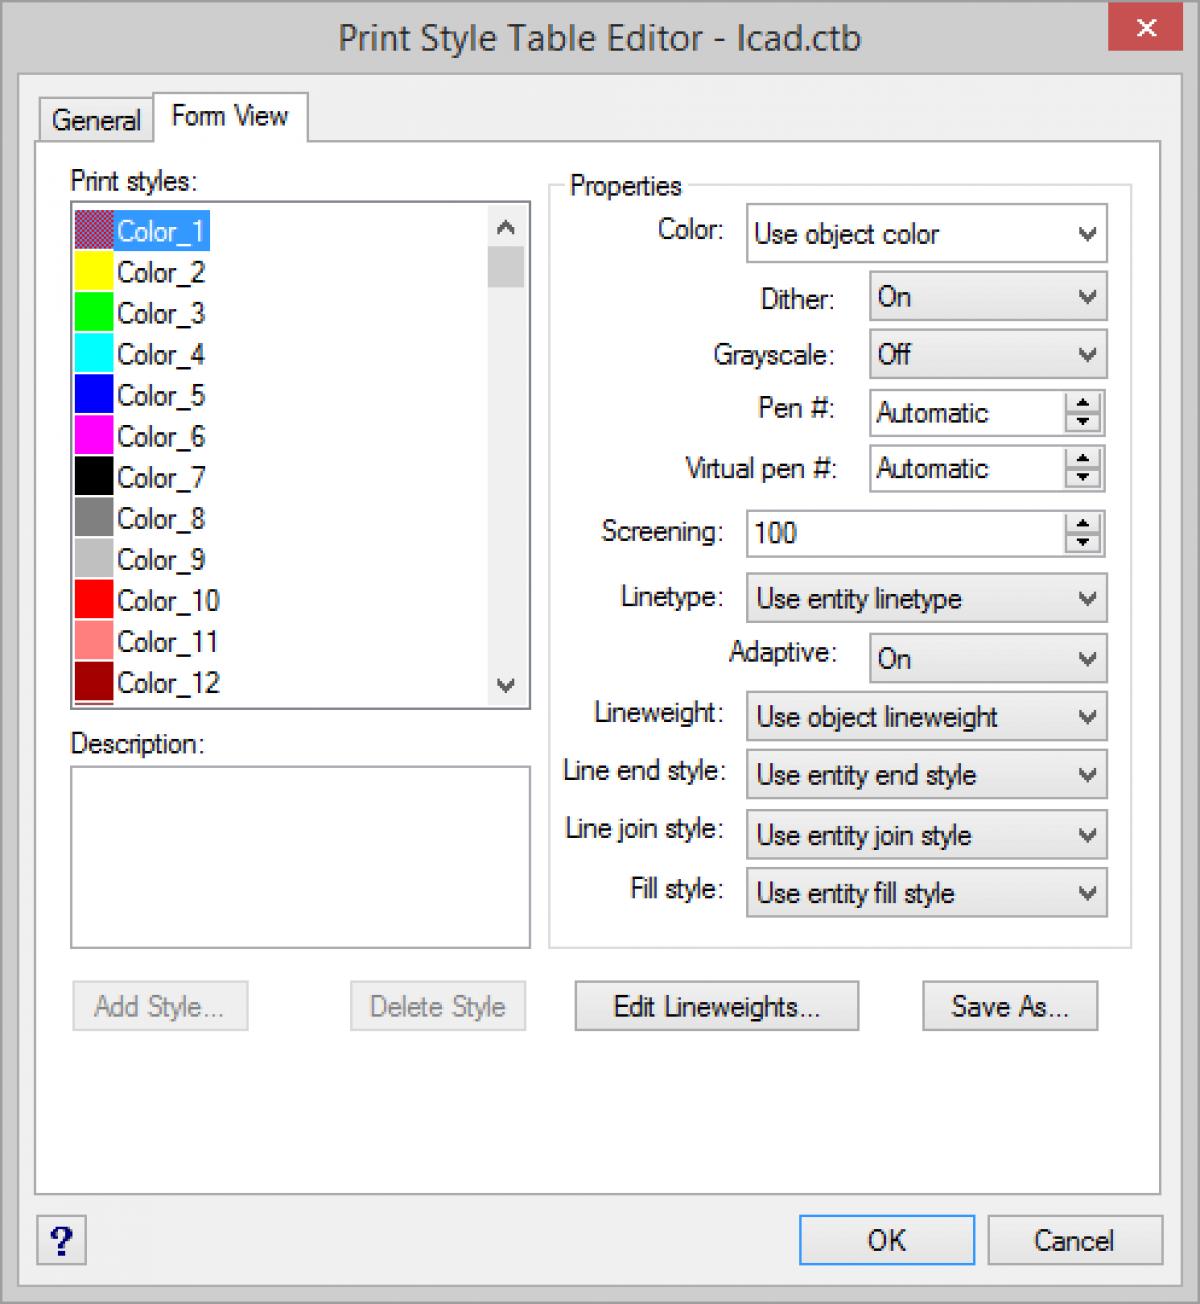 IntelliCAD Print Style Table Editor